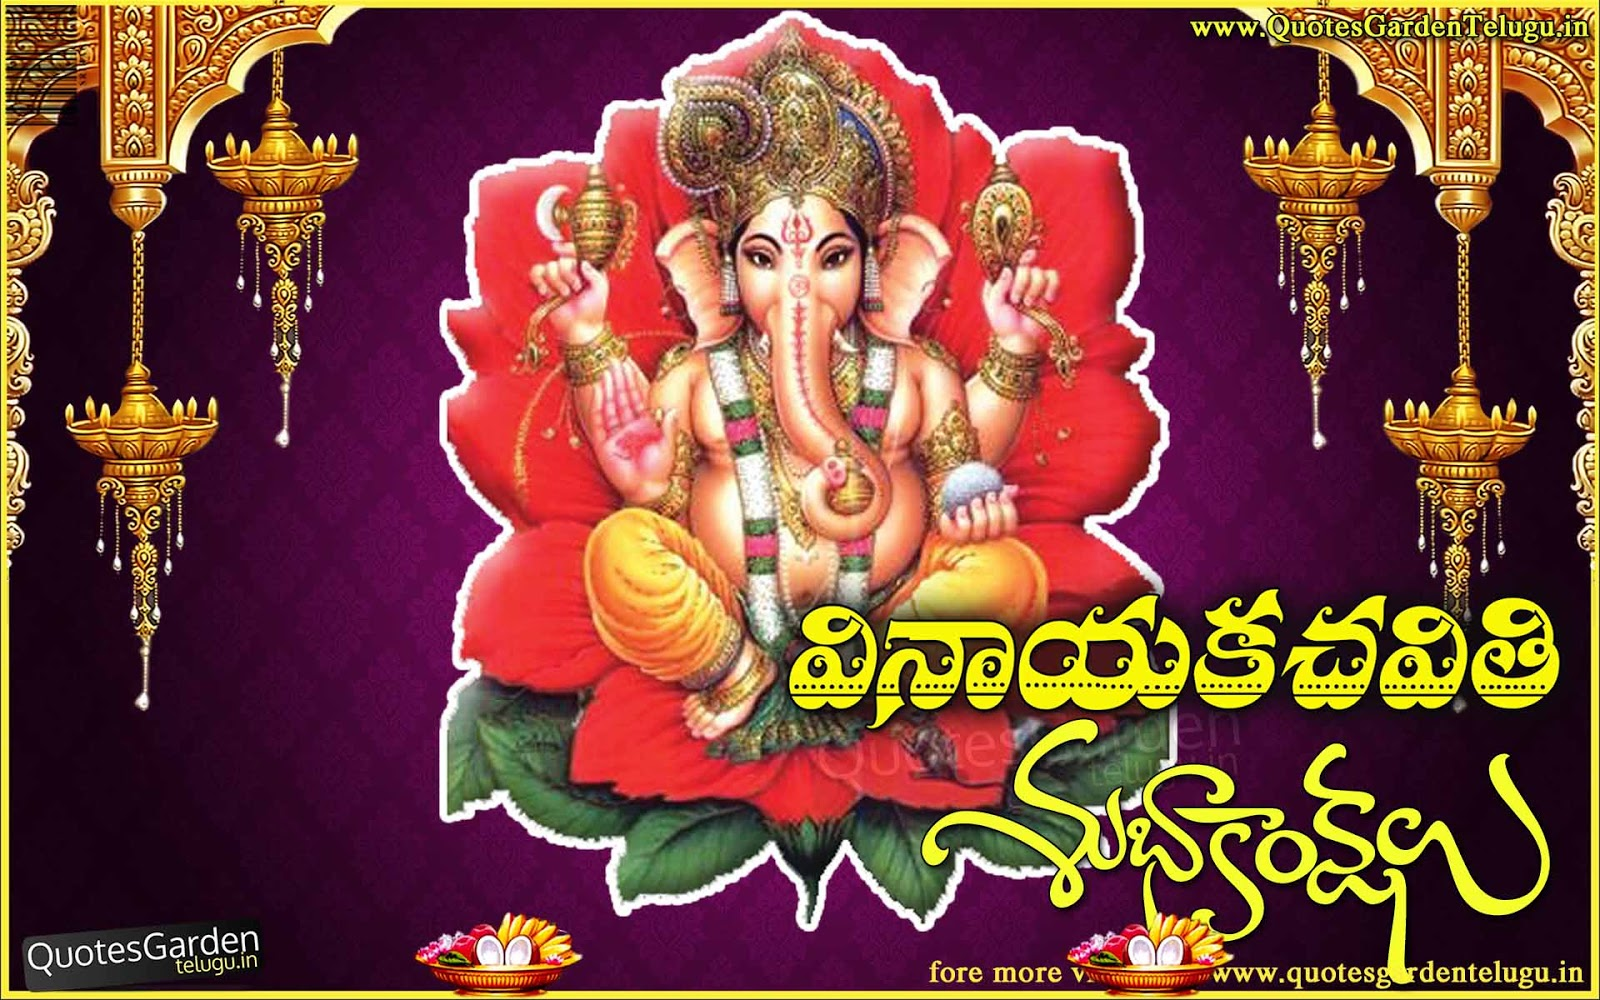 Vinayaka chaturthi 2016 telugu greetings quotes garden telugu vinayaka chaturthi 2016 telugu greetings m4hsunfo Gallery